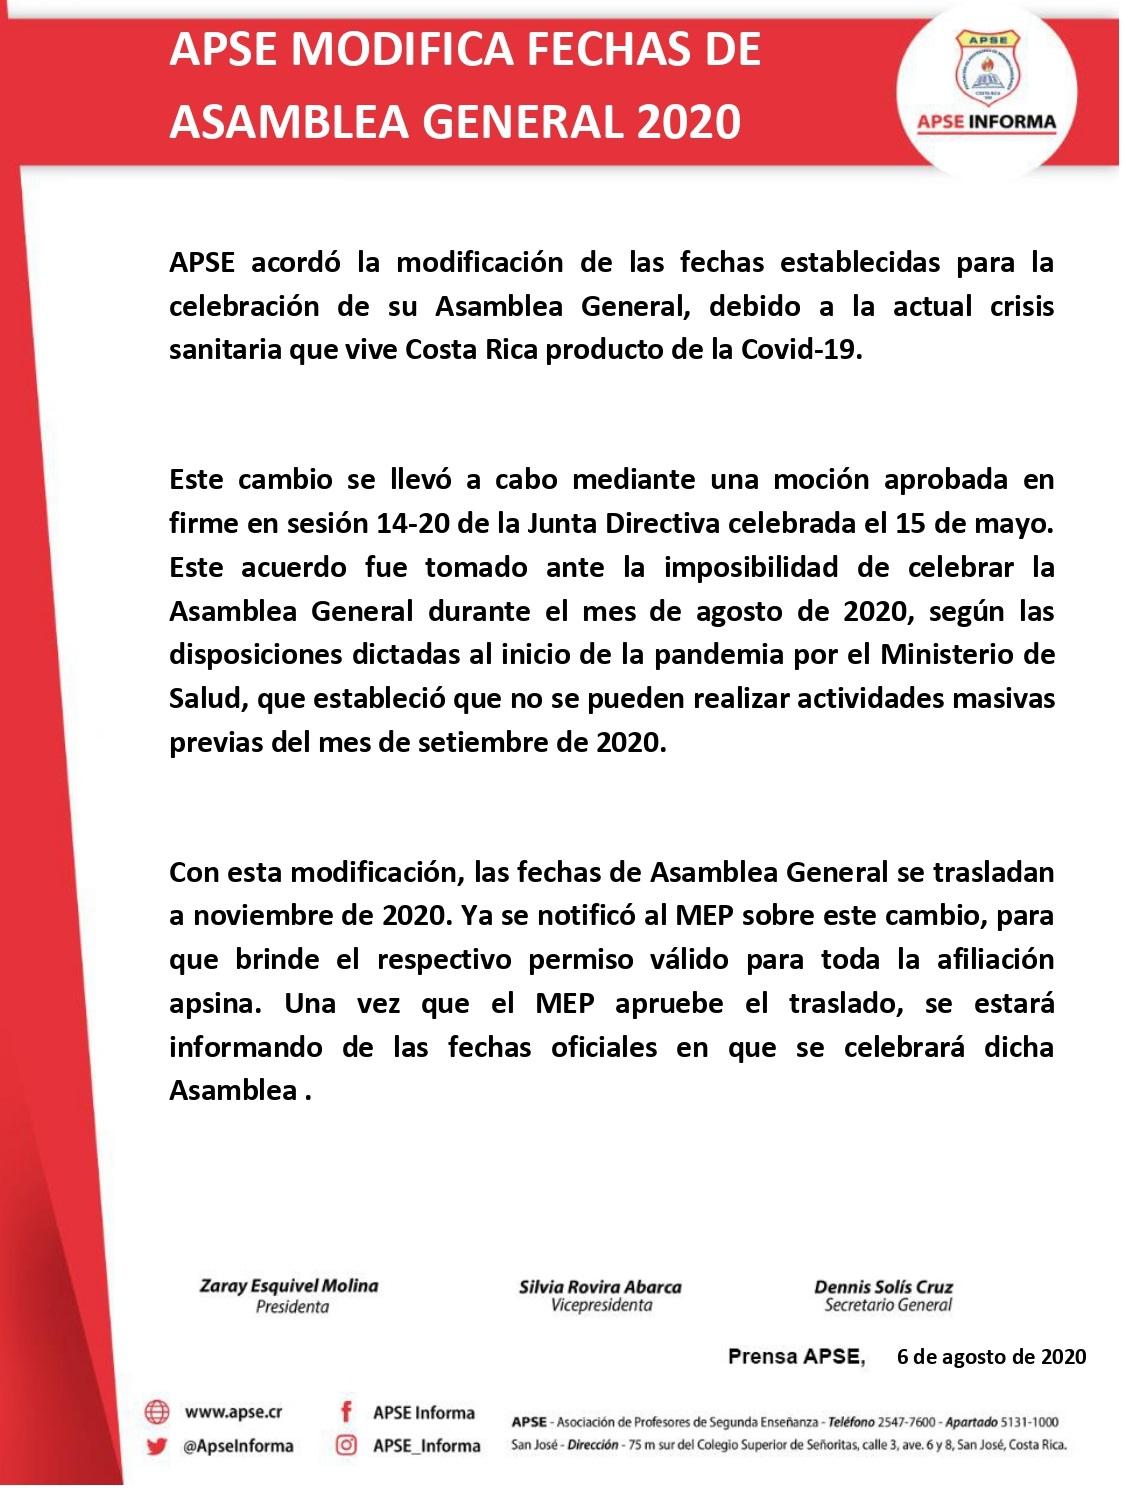 APSE MODIFICA FECHAS DE ASAMBLEA GENERAL 2020